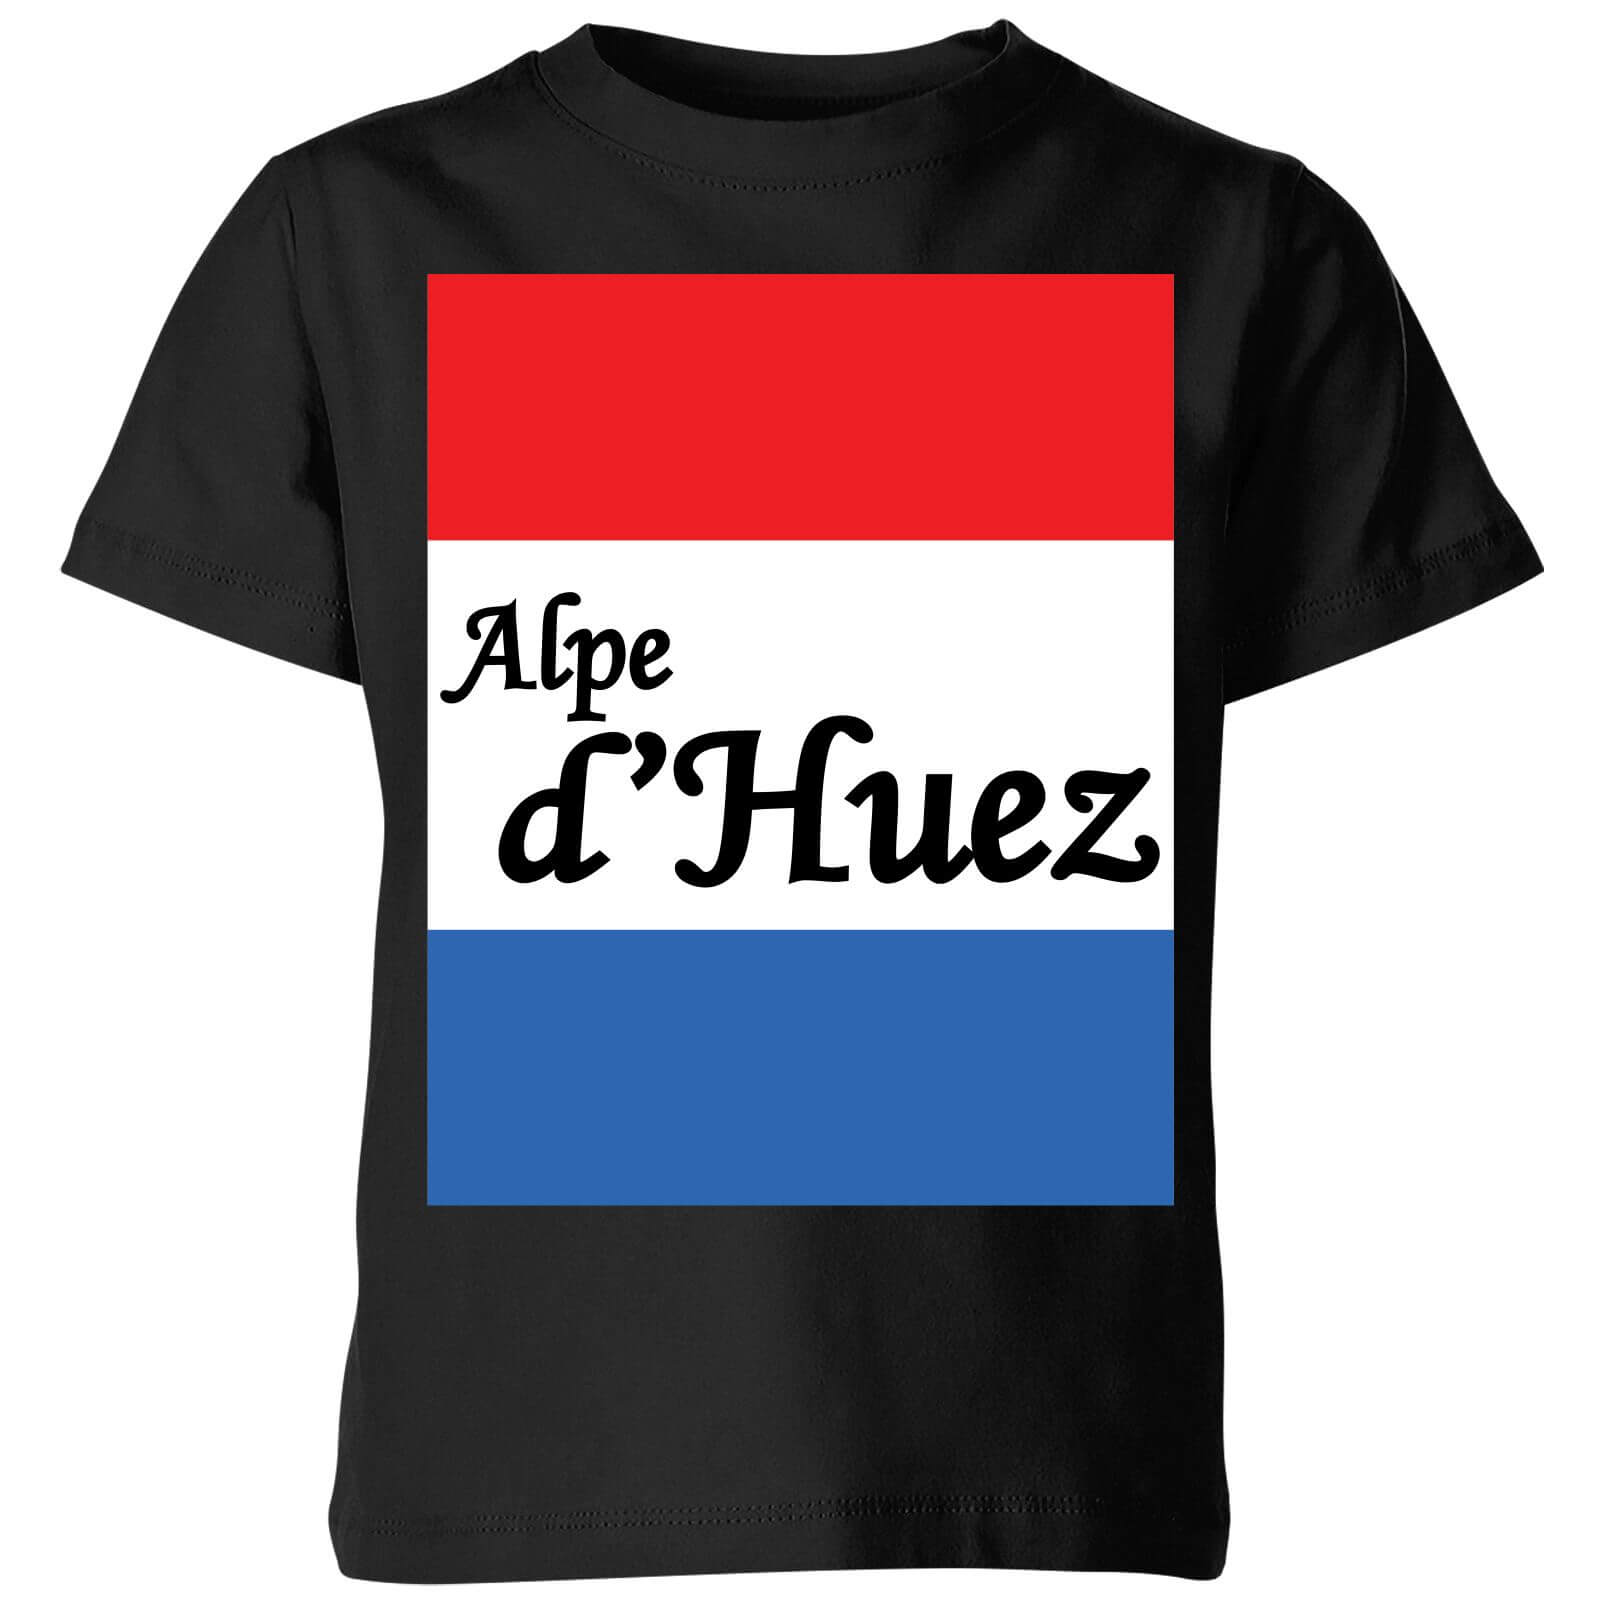 Summit Finish Alpe Dhuez Kids T-shirt - Black - 11-12 Years - Black